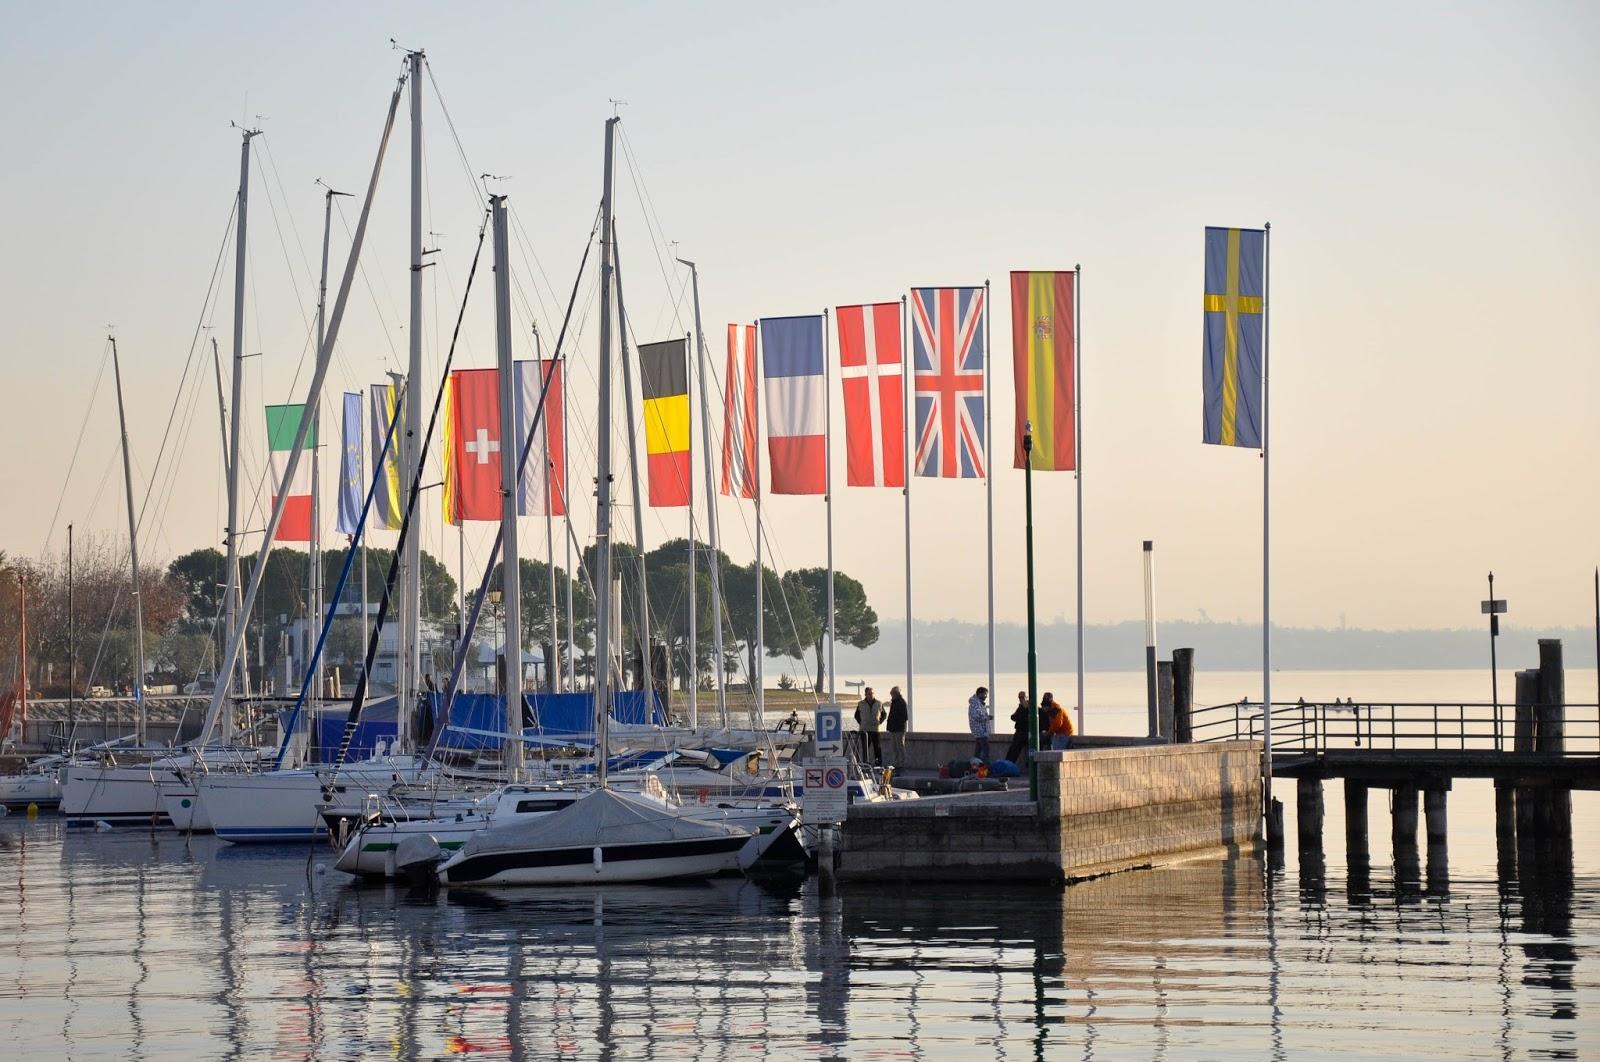 The wharf, Bardolino, Lake Garda, Italy